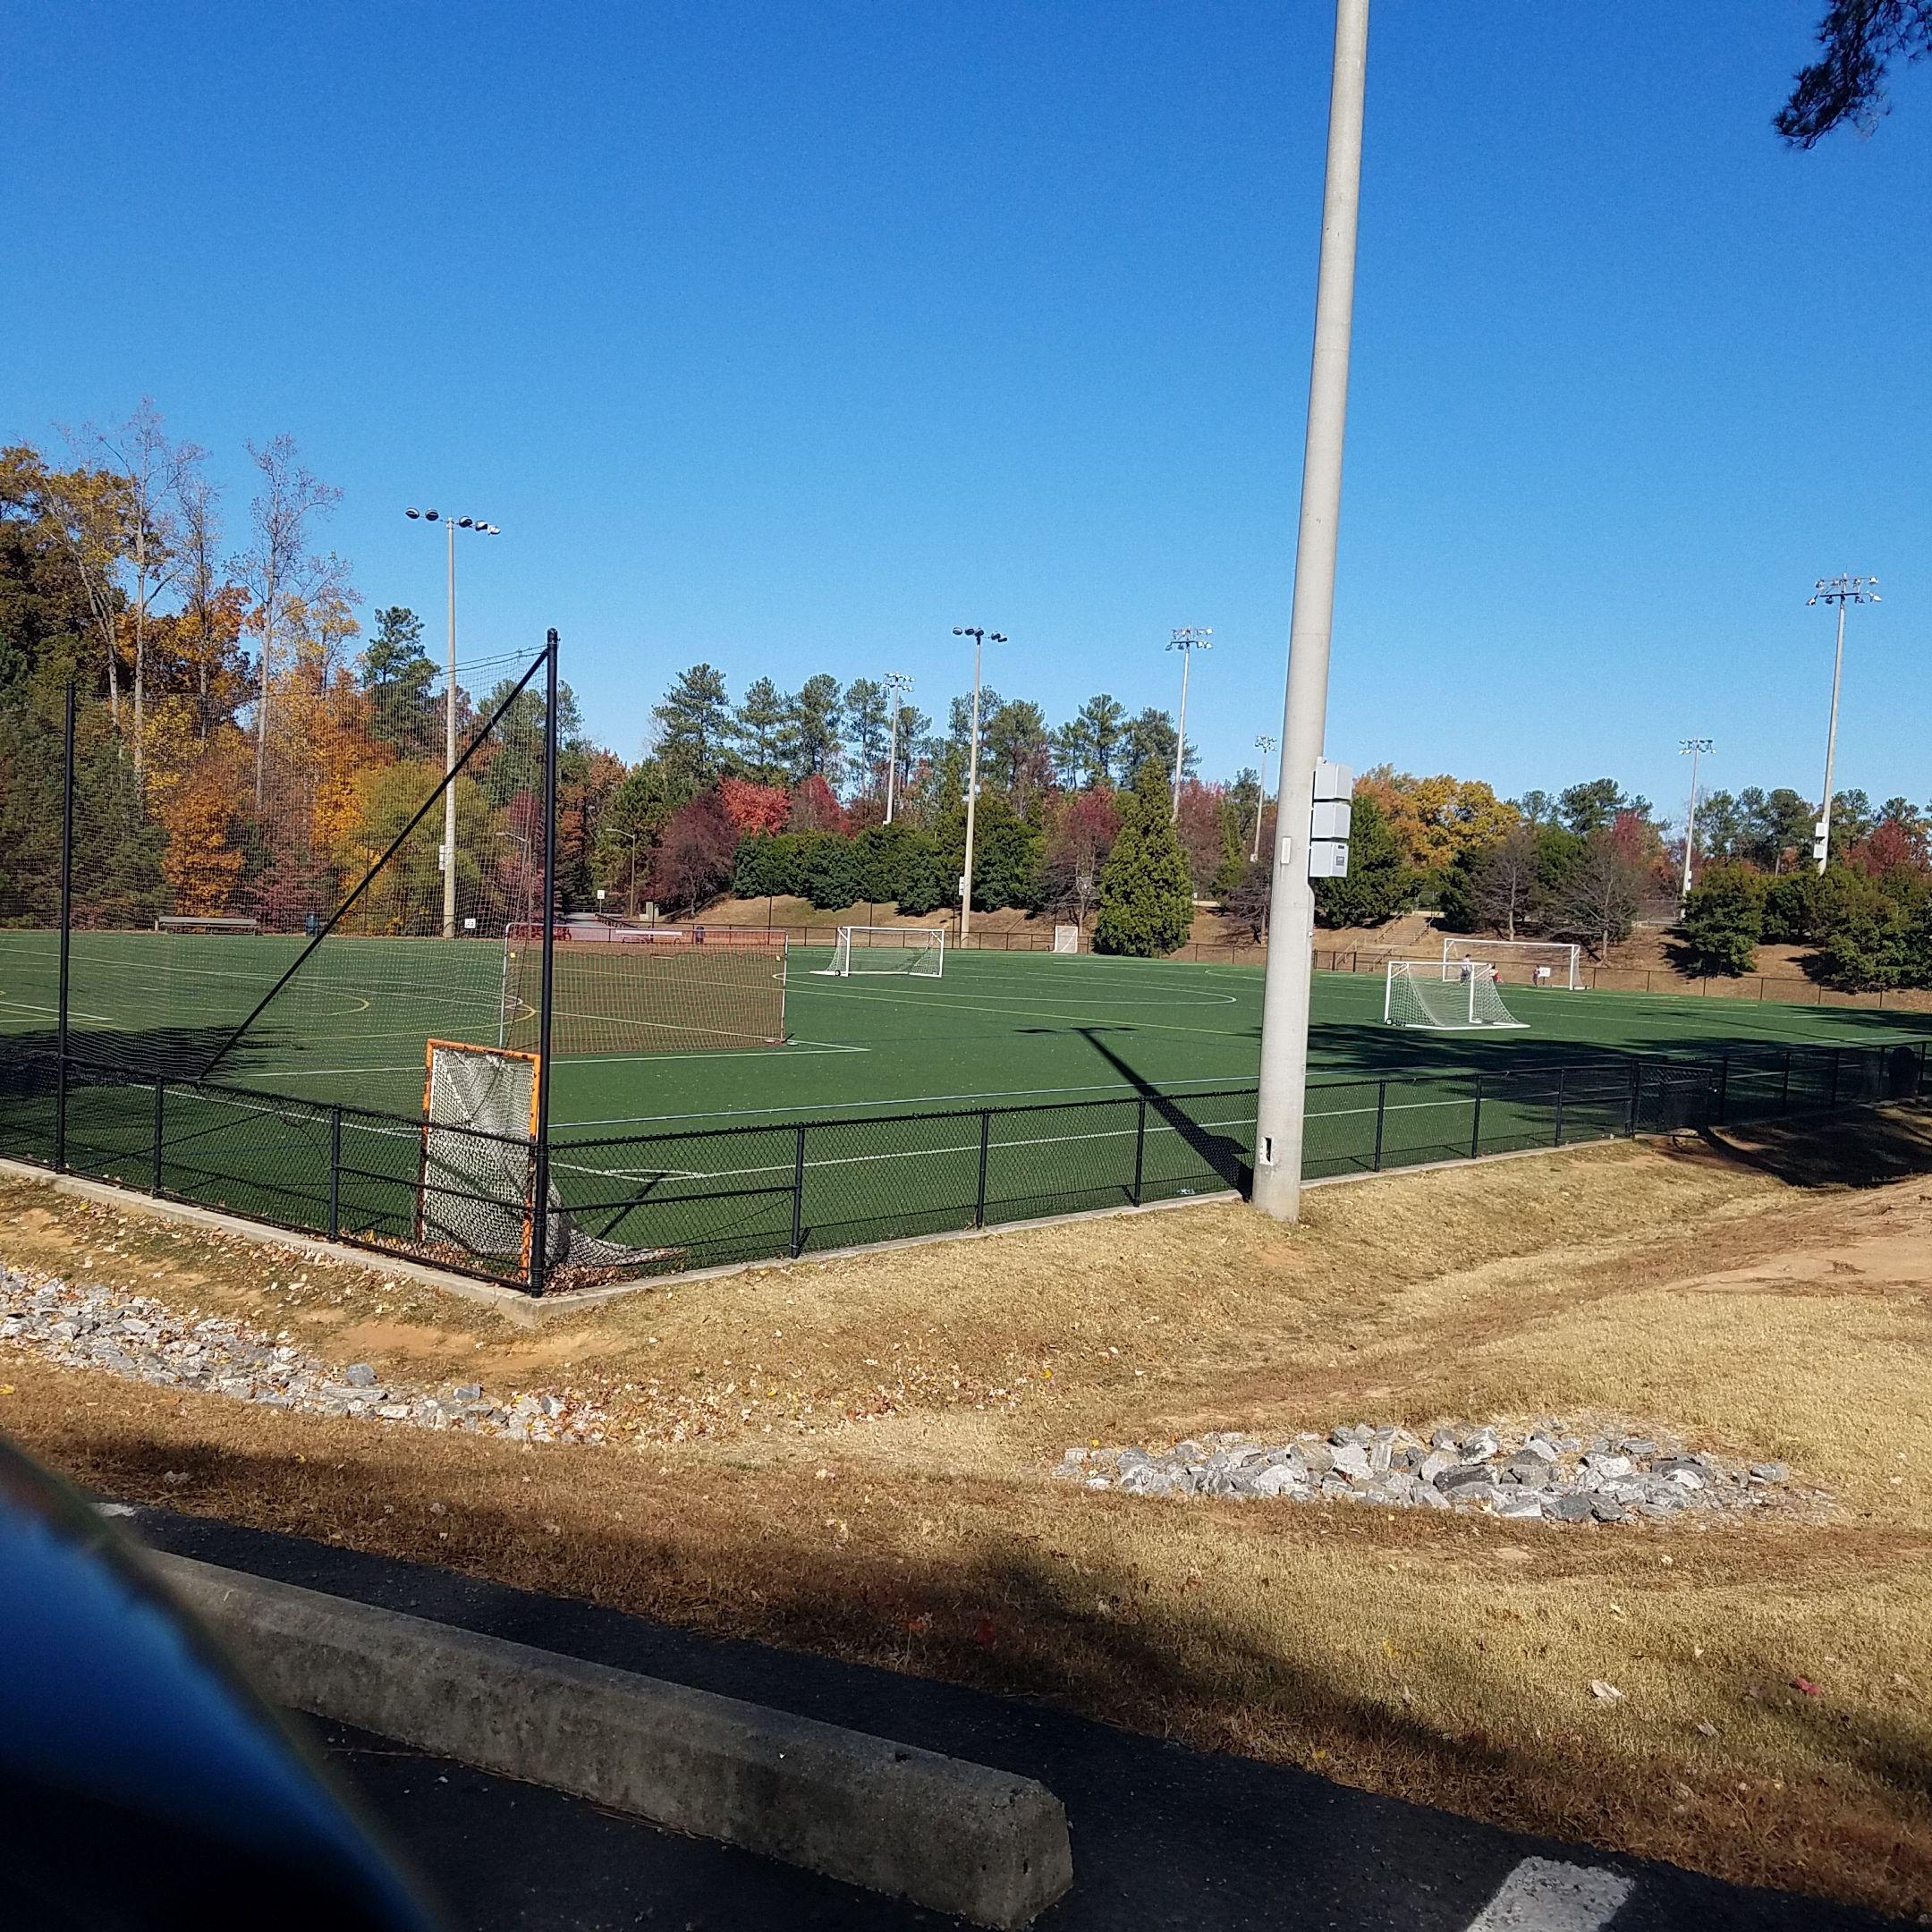 Alpharetta Ga Mail: Alpharetta Recreational Pickup Soccer (Alpharetta